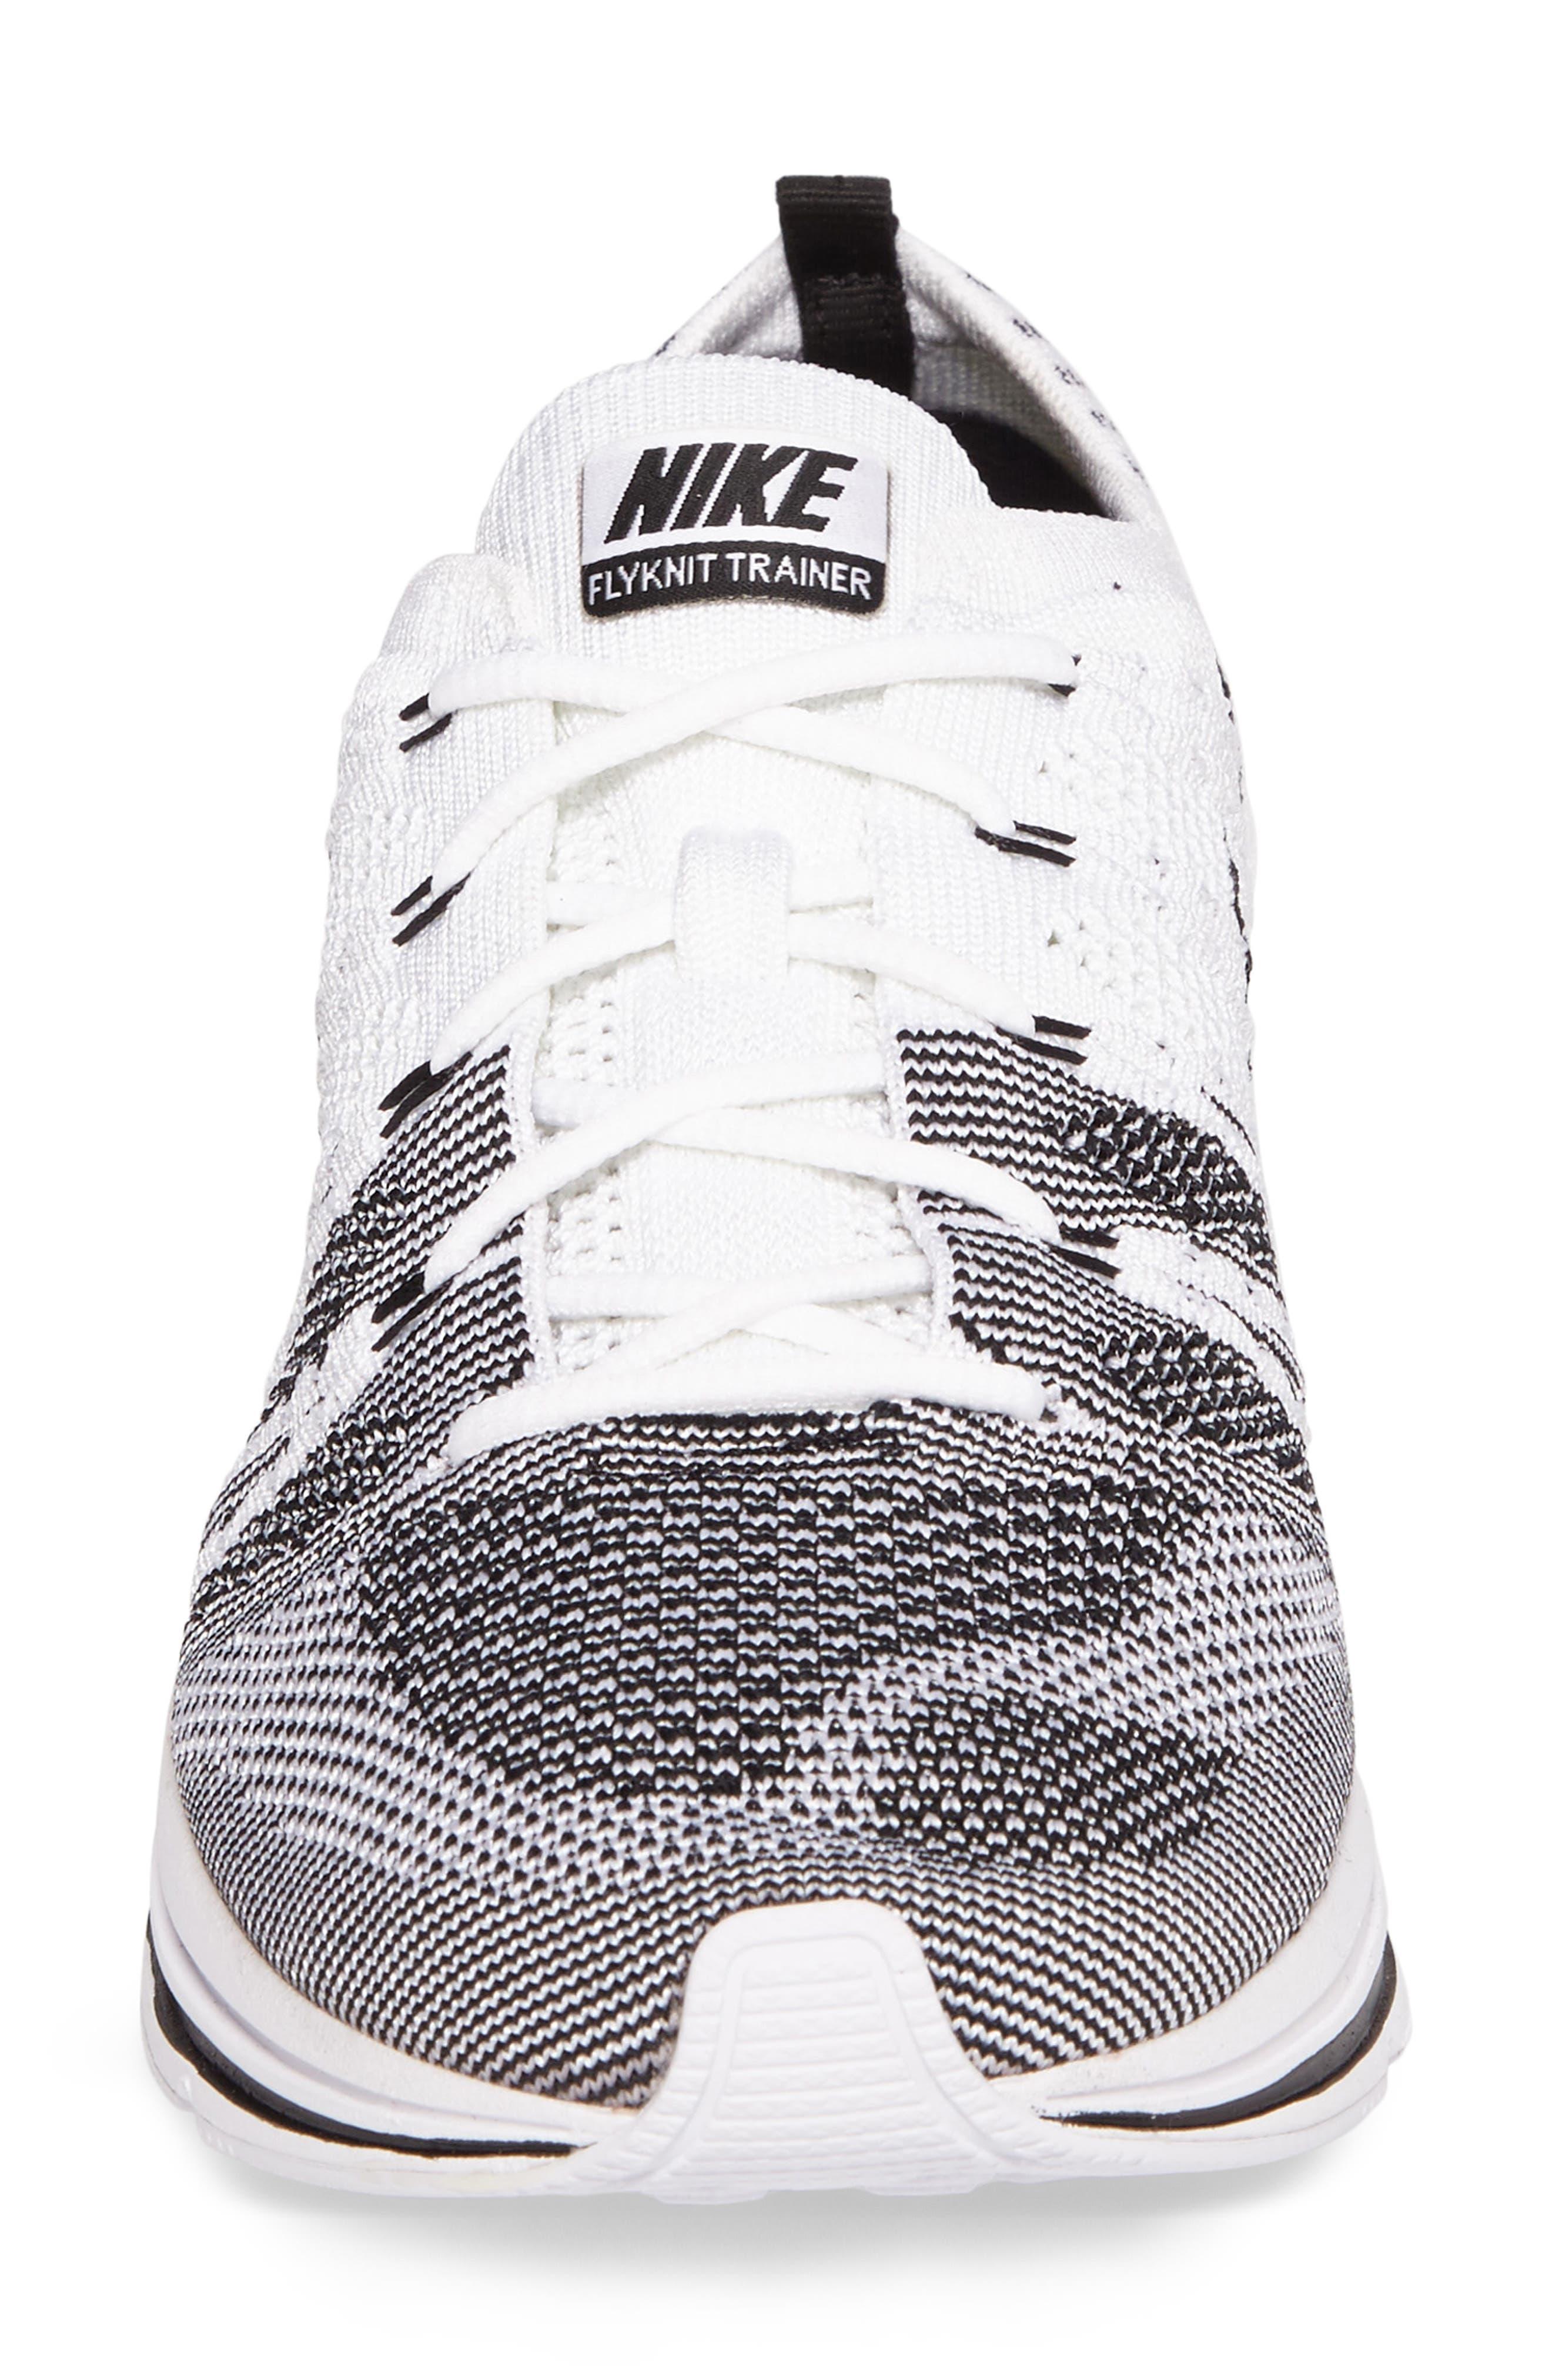 NikeLab Flyknit Trainer Sneaker,                             Alternate thumbnail 4, color,                             100